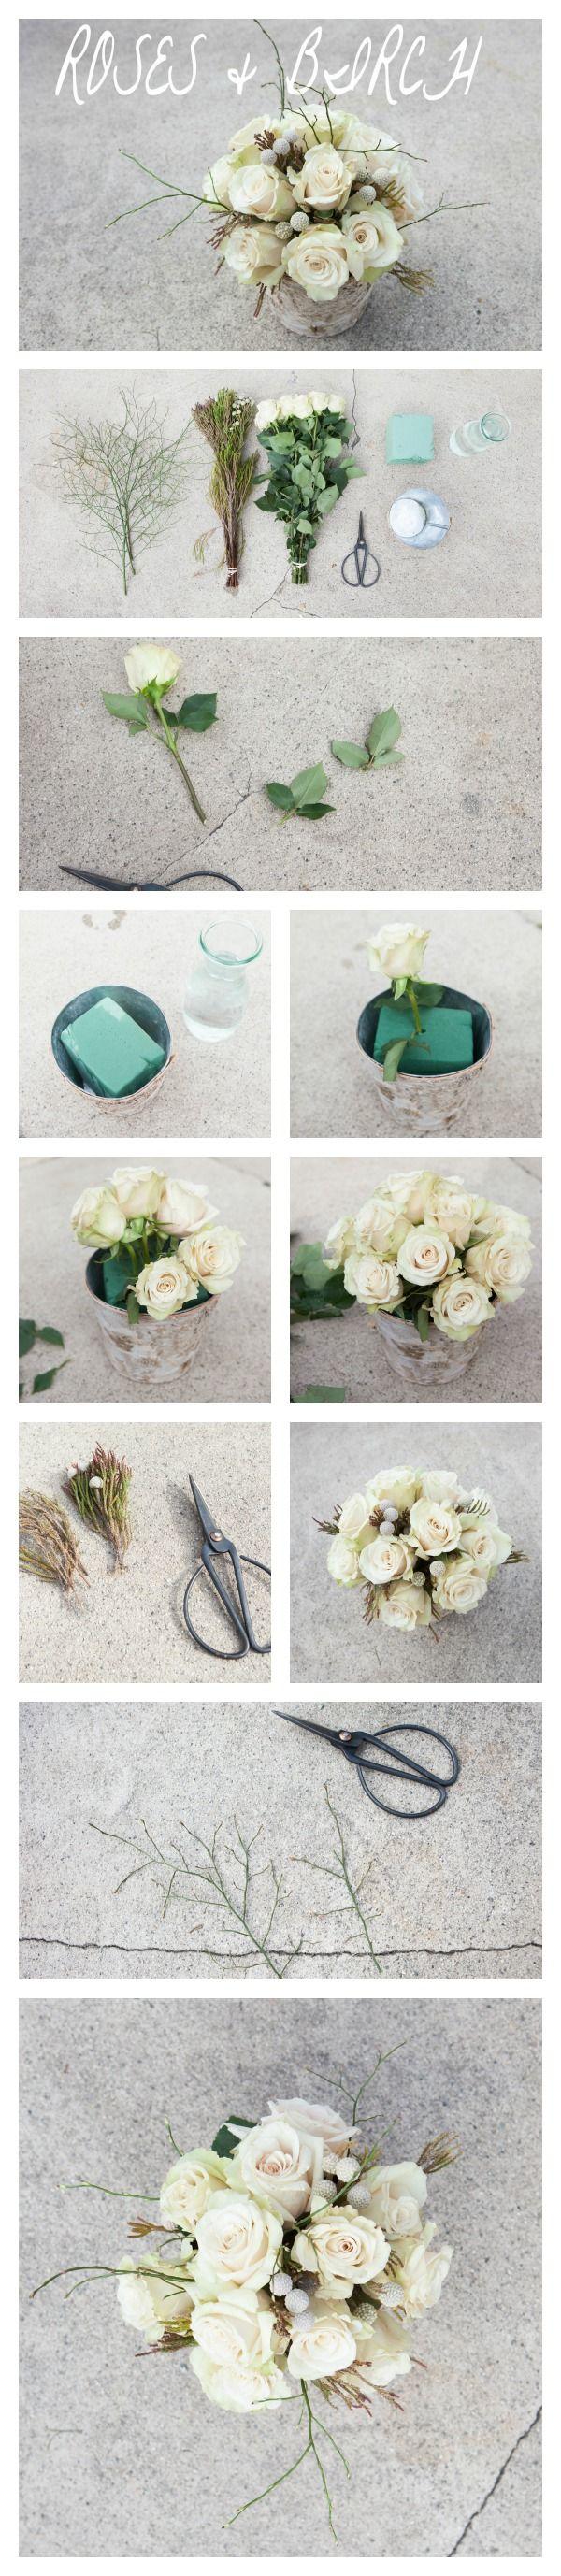 Rose & Birch Centerpiece Step By Step DIY Tutorial